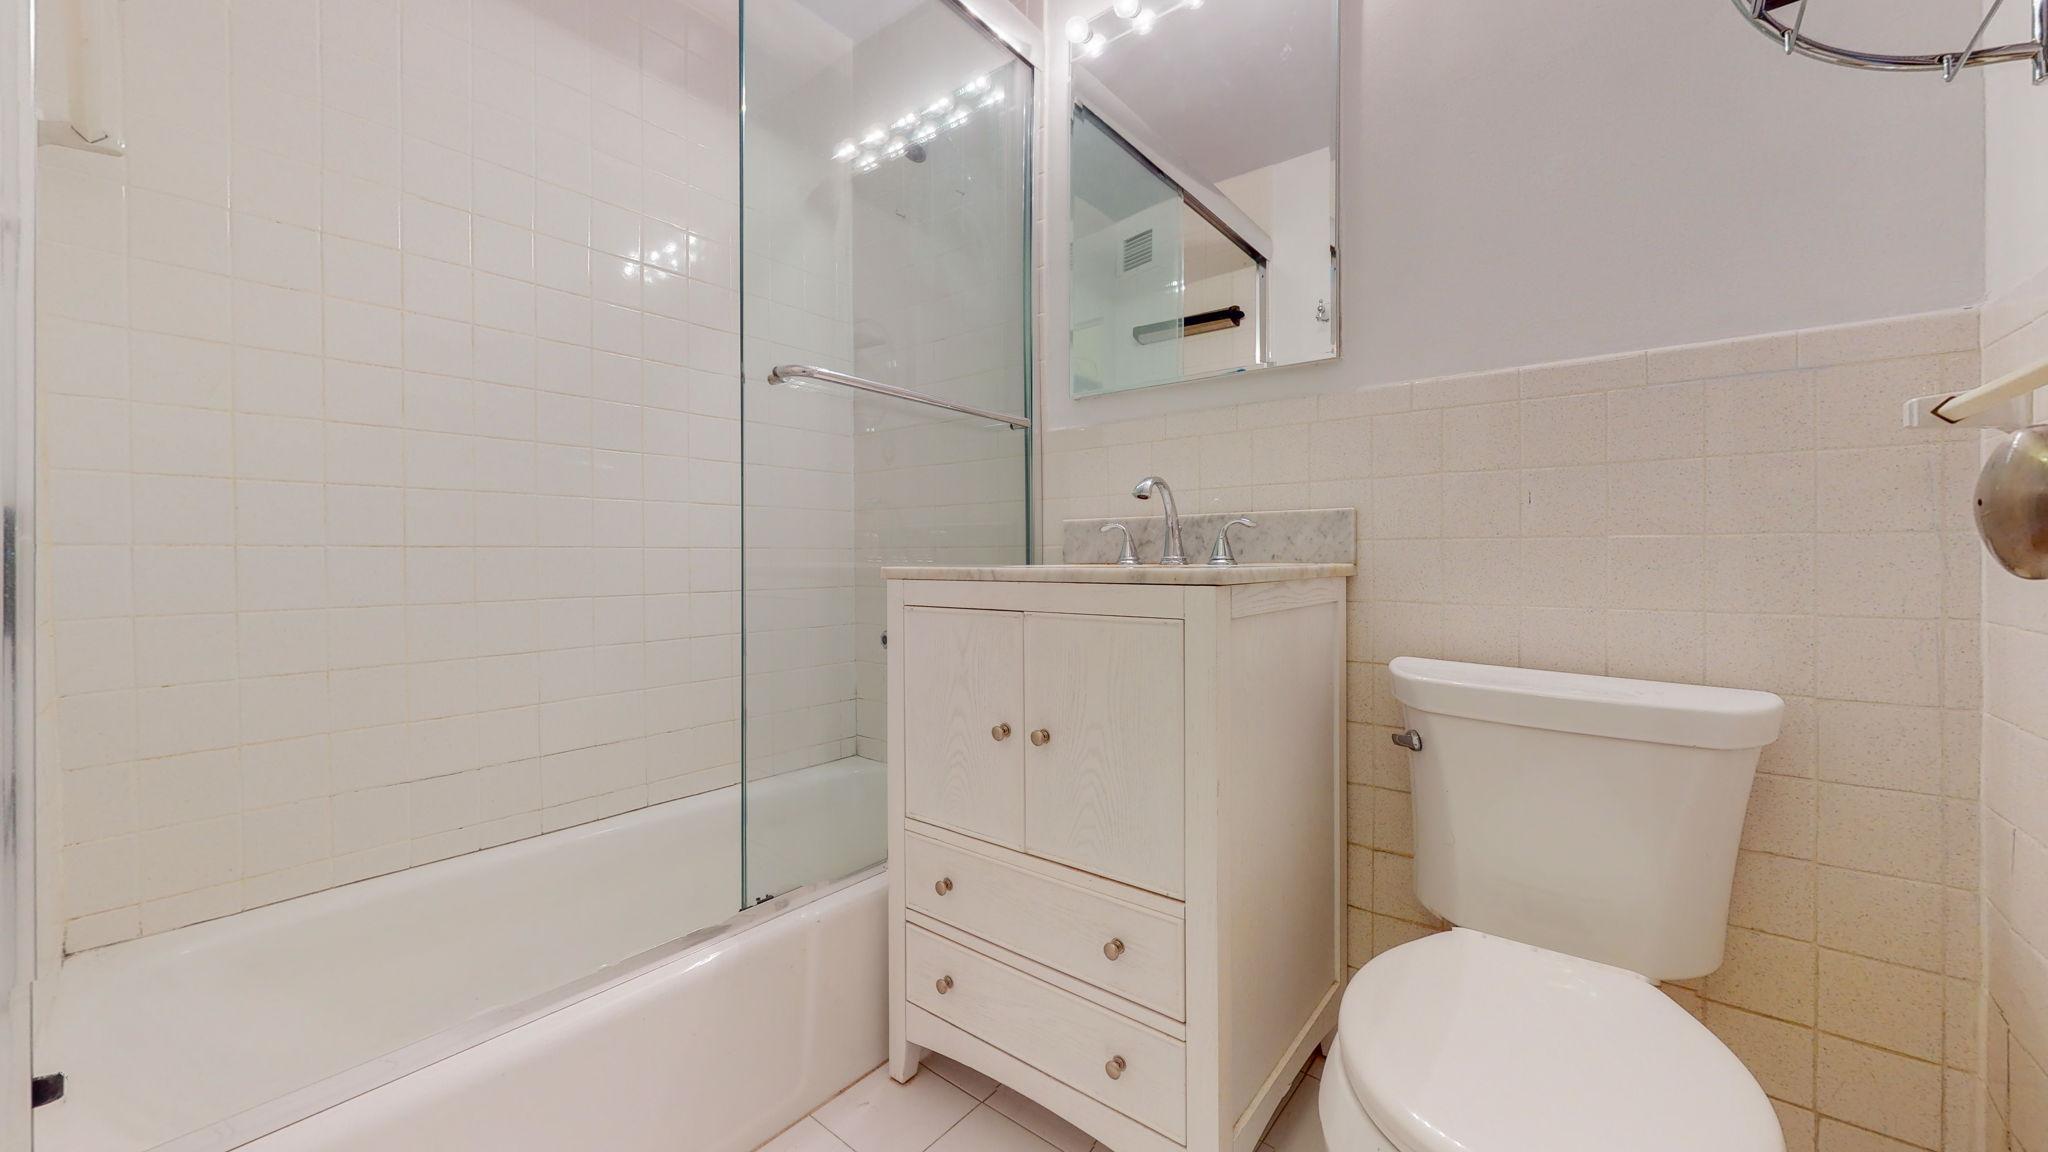 305 East 24th Street, New York, New York, New York, United States 10010, 1 Bedroom Bedrooms, ,1 BathroomBathrooms,Co-op,IN-CONTRACT,New York Towers,East 24th Street,1141